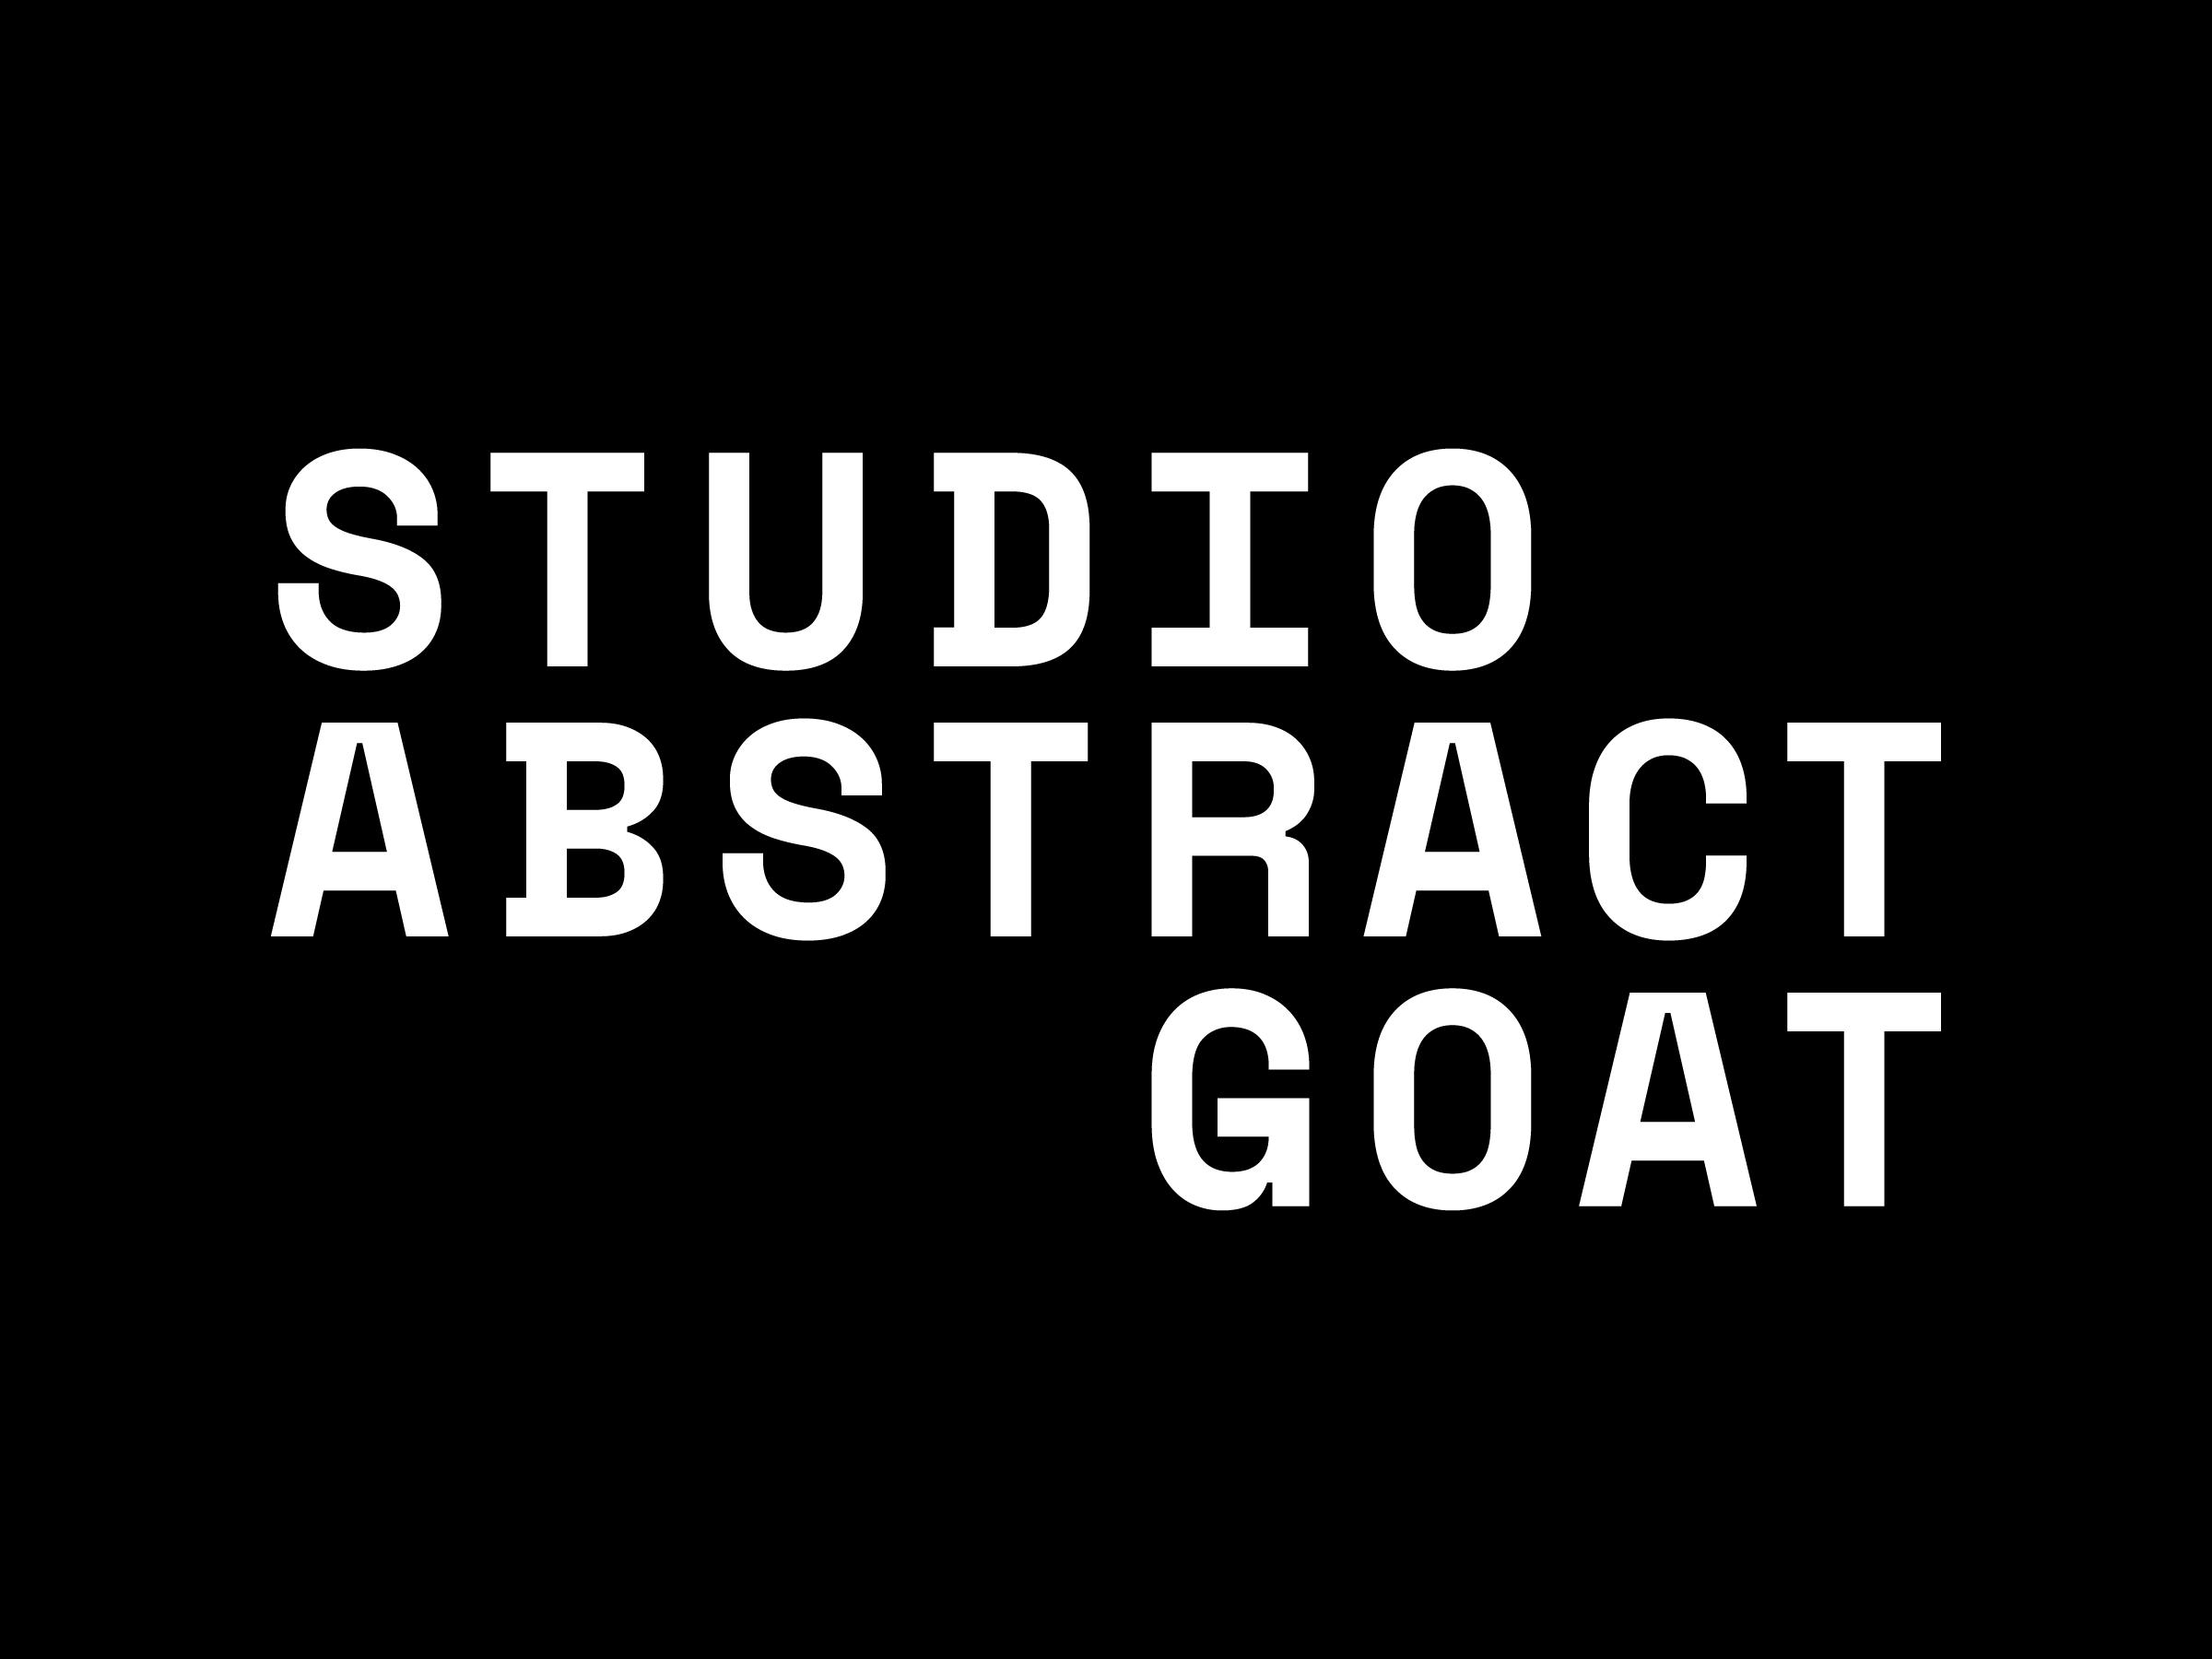 01_abstract_goat_wordmark